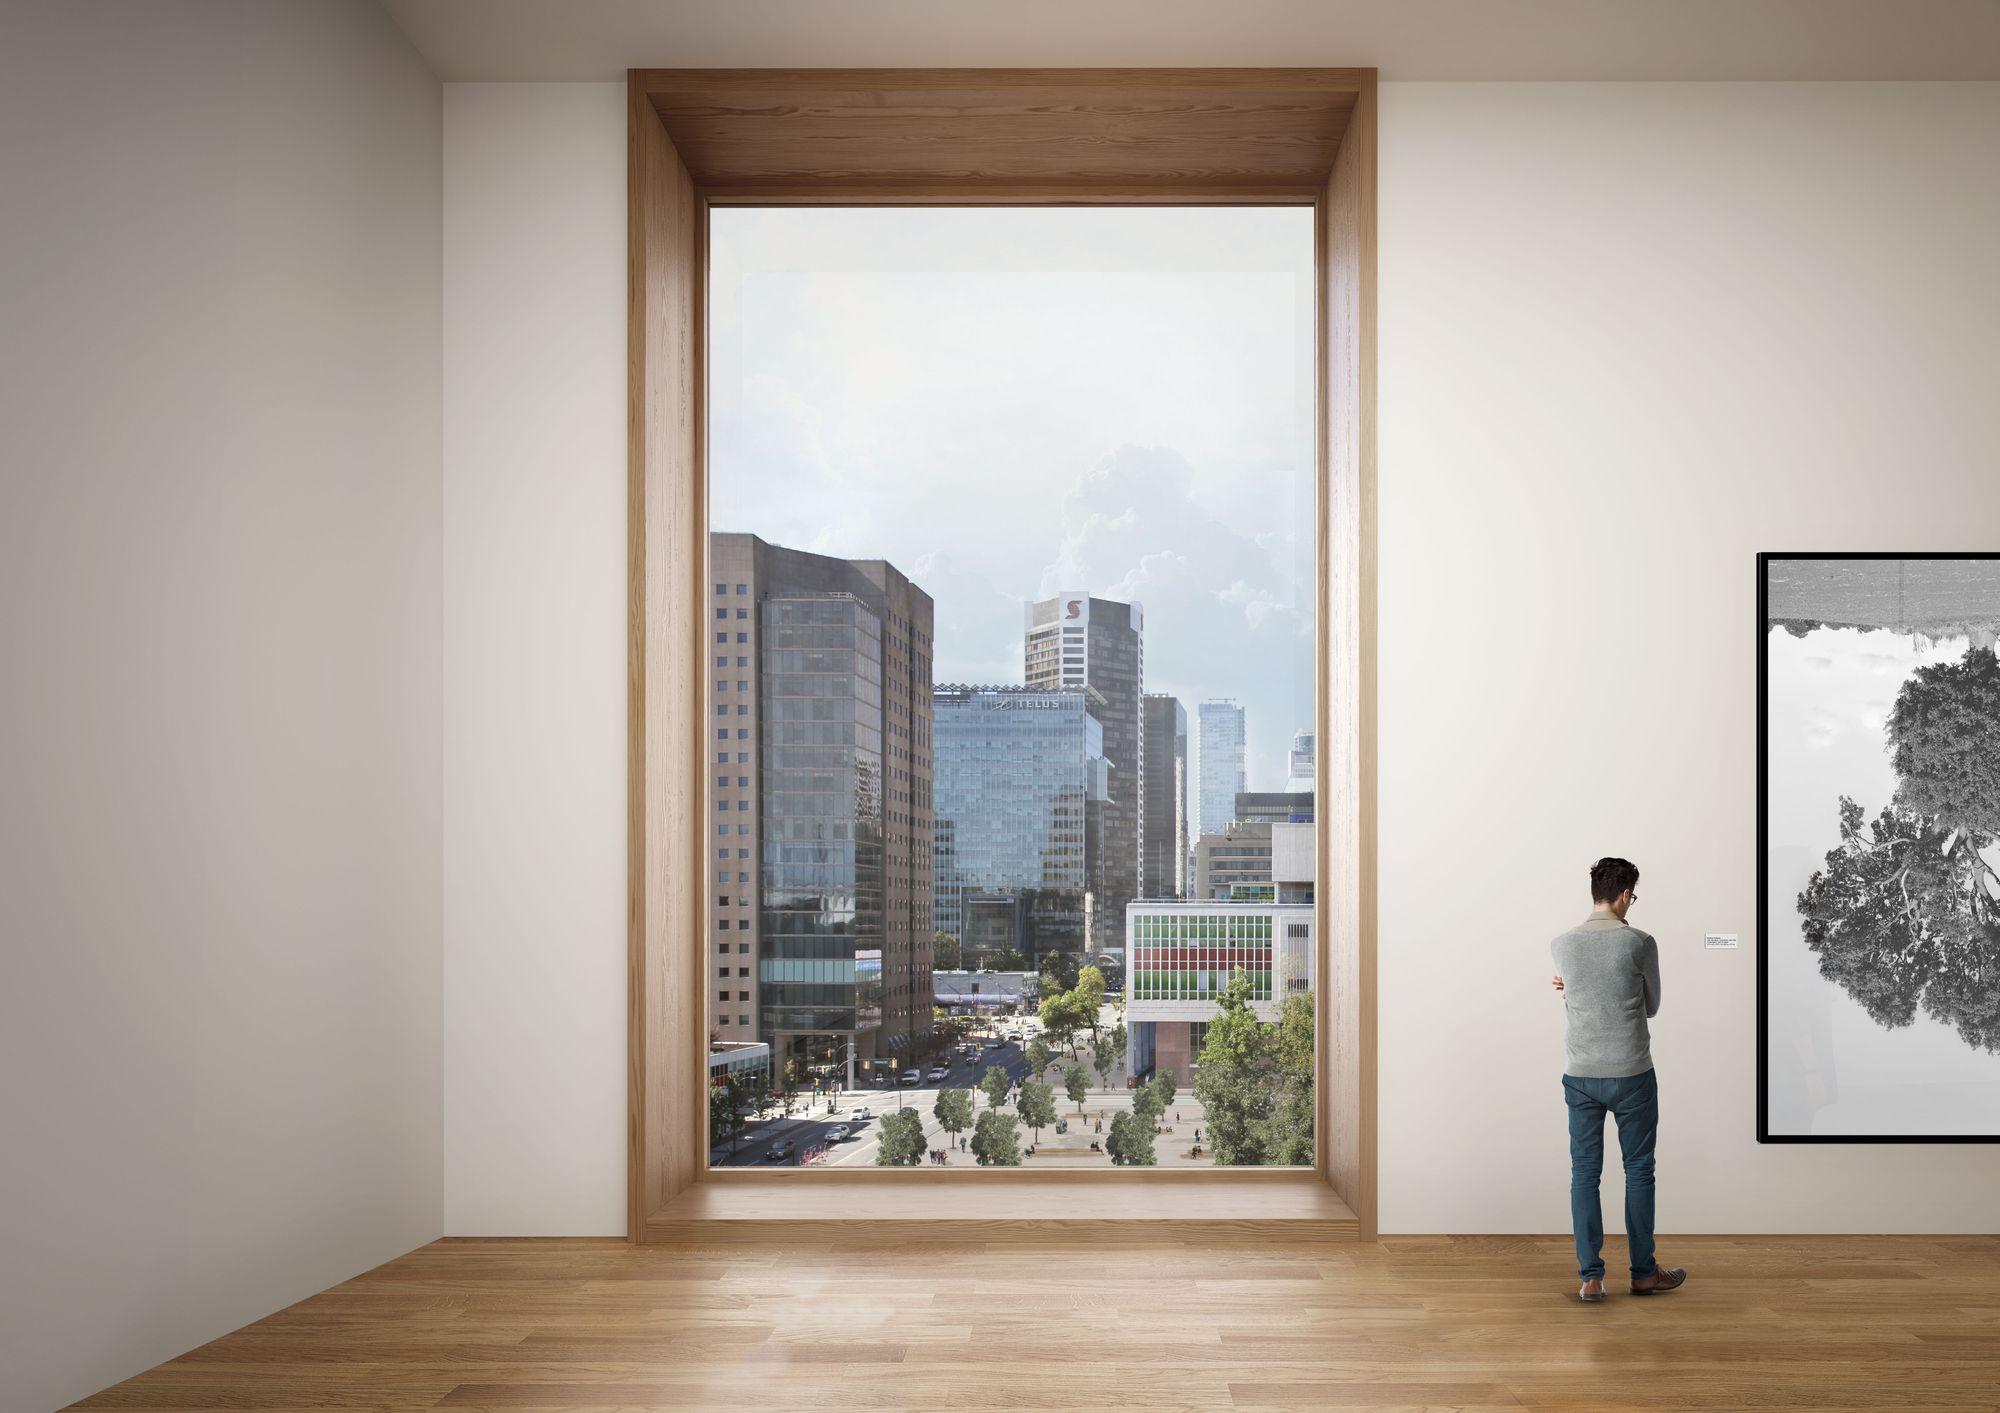 Galeria De Herzog & Meuron Projeta Nova Arte